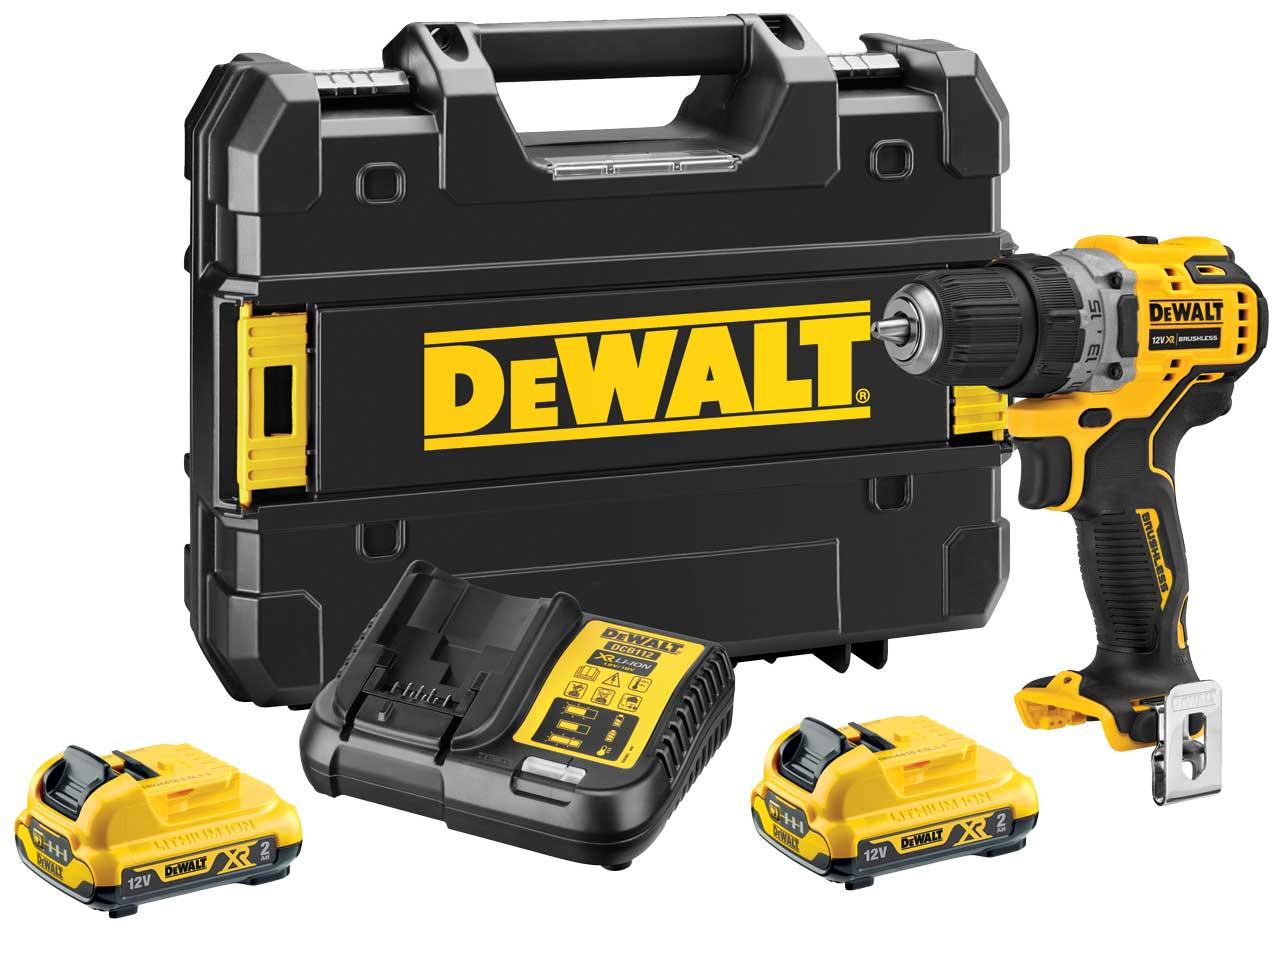 DeWalt DCD701D2 12V 2 x 2Ah XR Brushless Sub Compact drill driver - £128.25 with code @ FFX